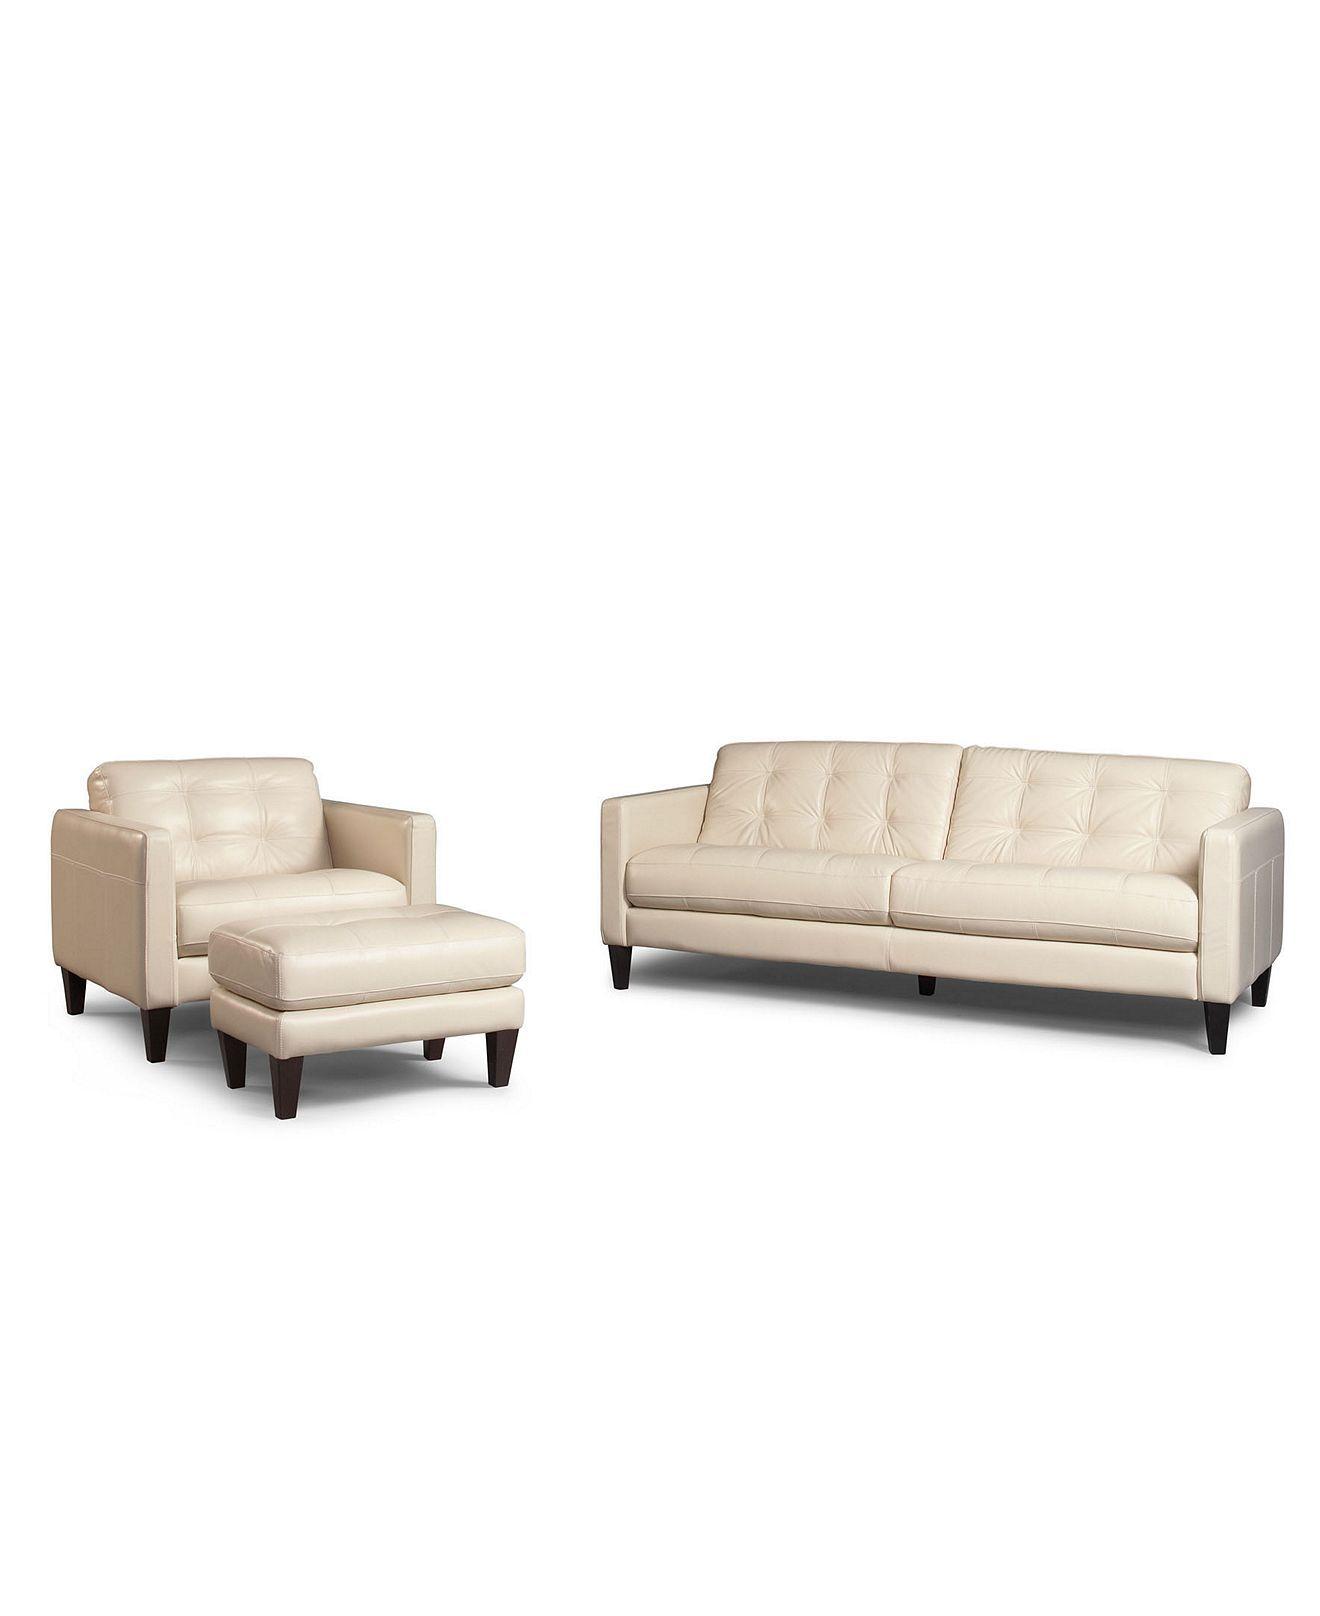 Milan Leather Sofa Macys: Milan 3-Piece Leather Sofa Set: Sofa, Chair And Ottoman